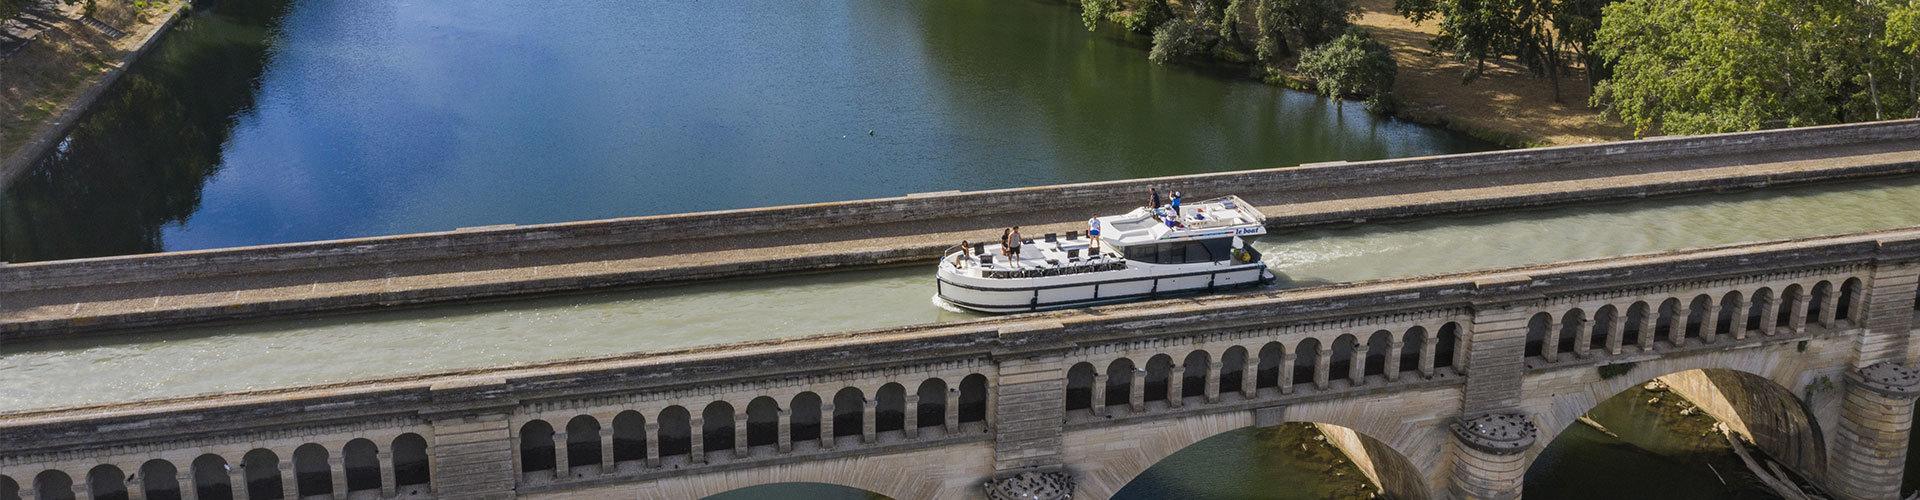 Vacanza in houseboat con Le Boat